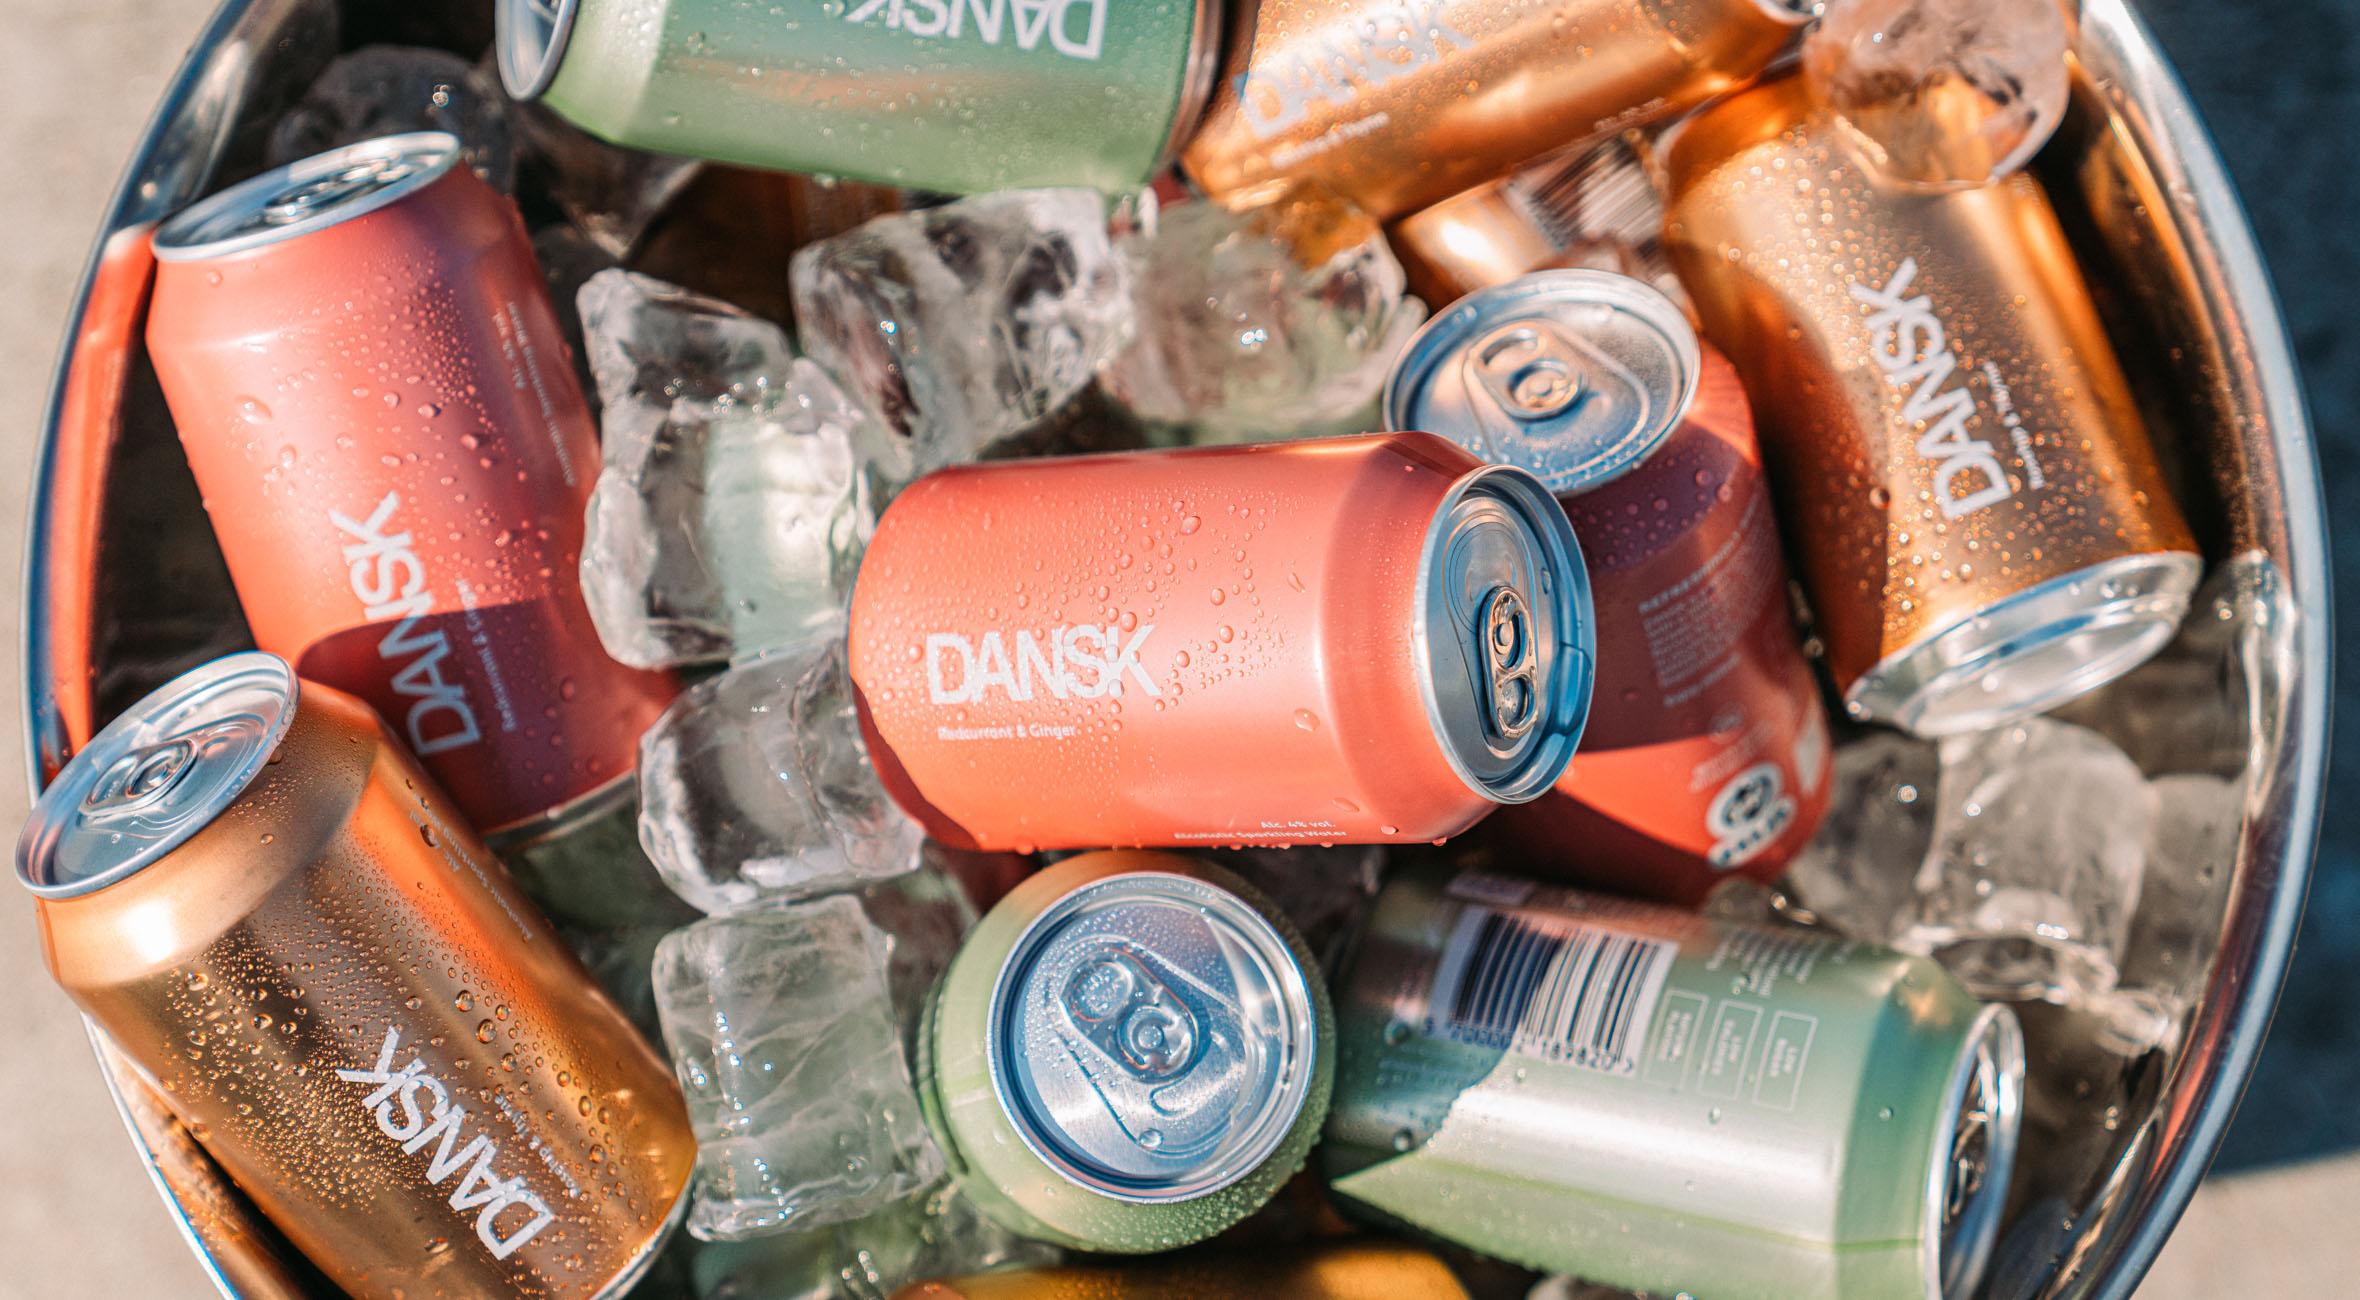 12 hard seltzers fra DANSK leveret direkte til din dør – Dansk start-up storsatser på ny alkoholdrik fra USA